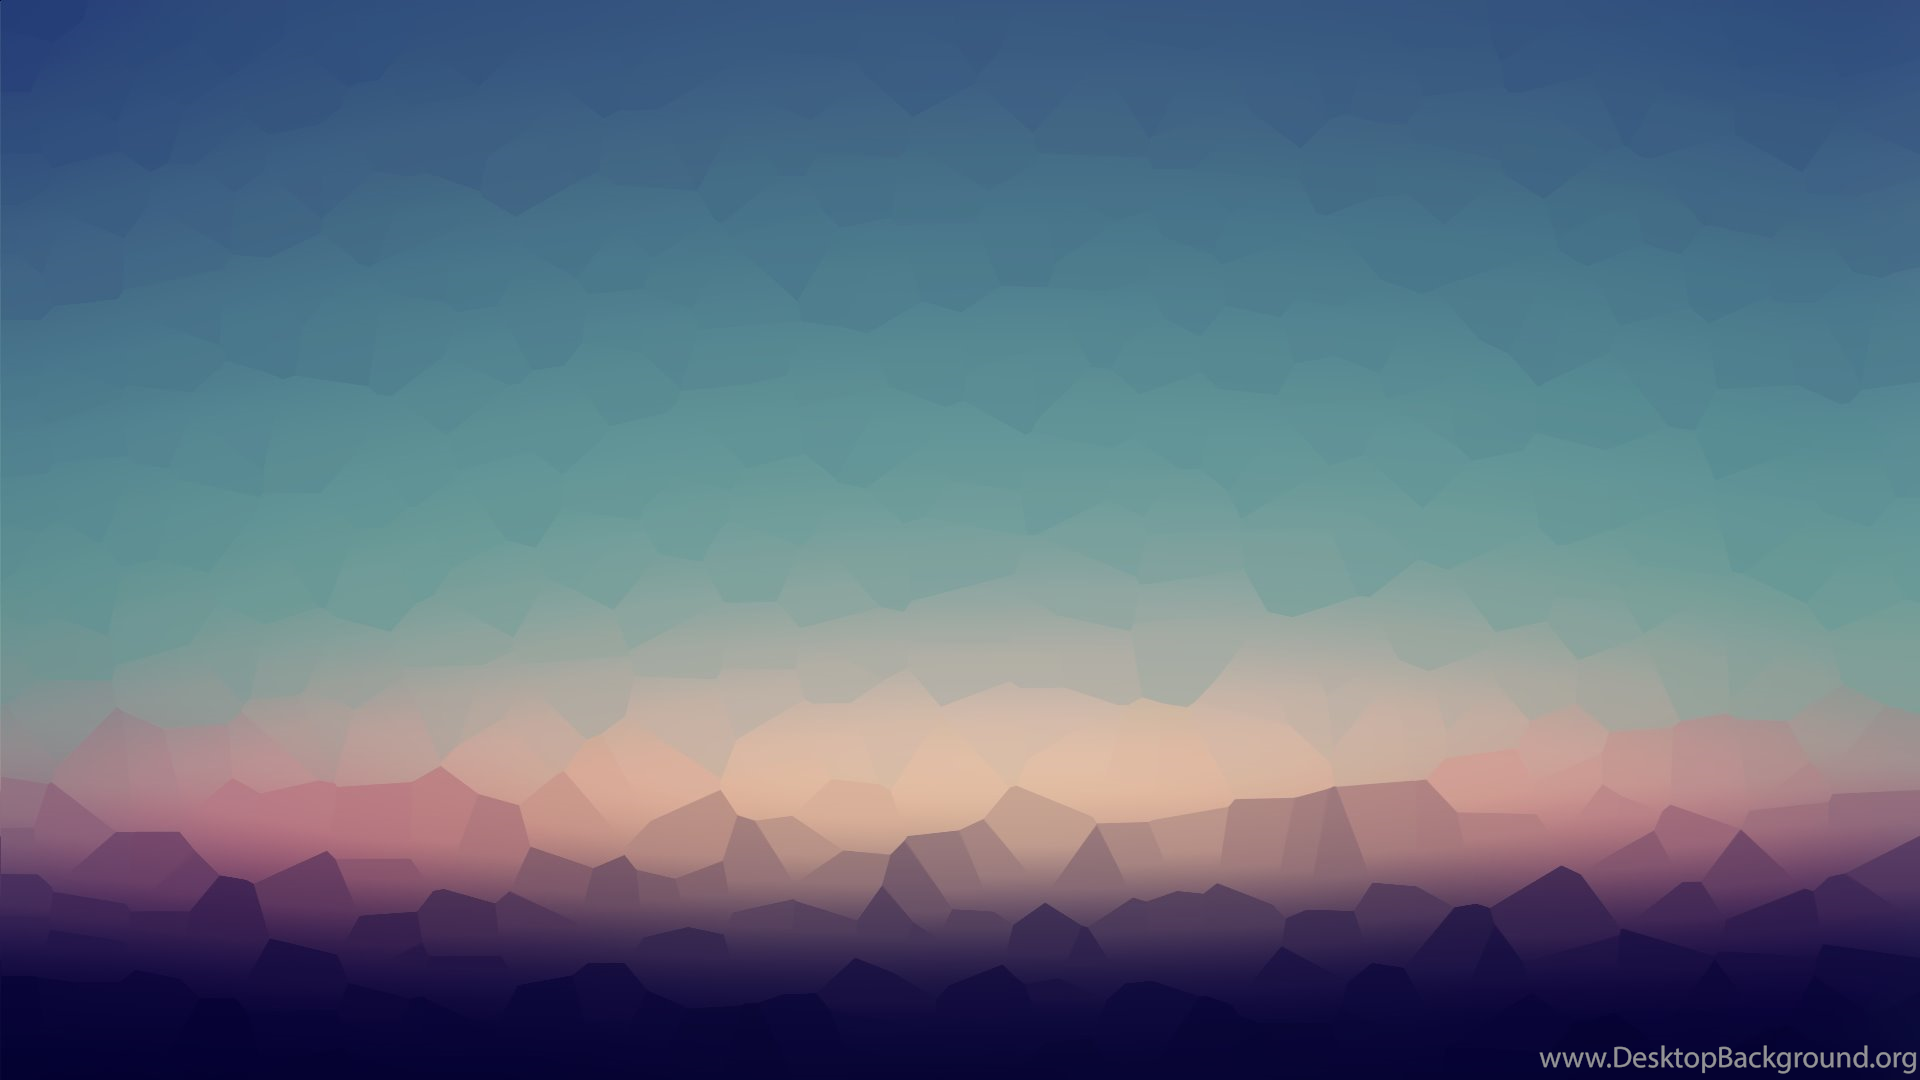 Digital art simple backgrounds wallpapers hd desktop - Simplistic wallpaper ...